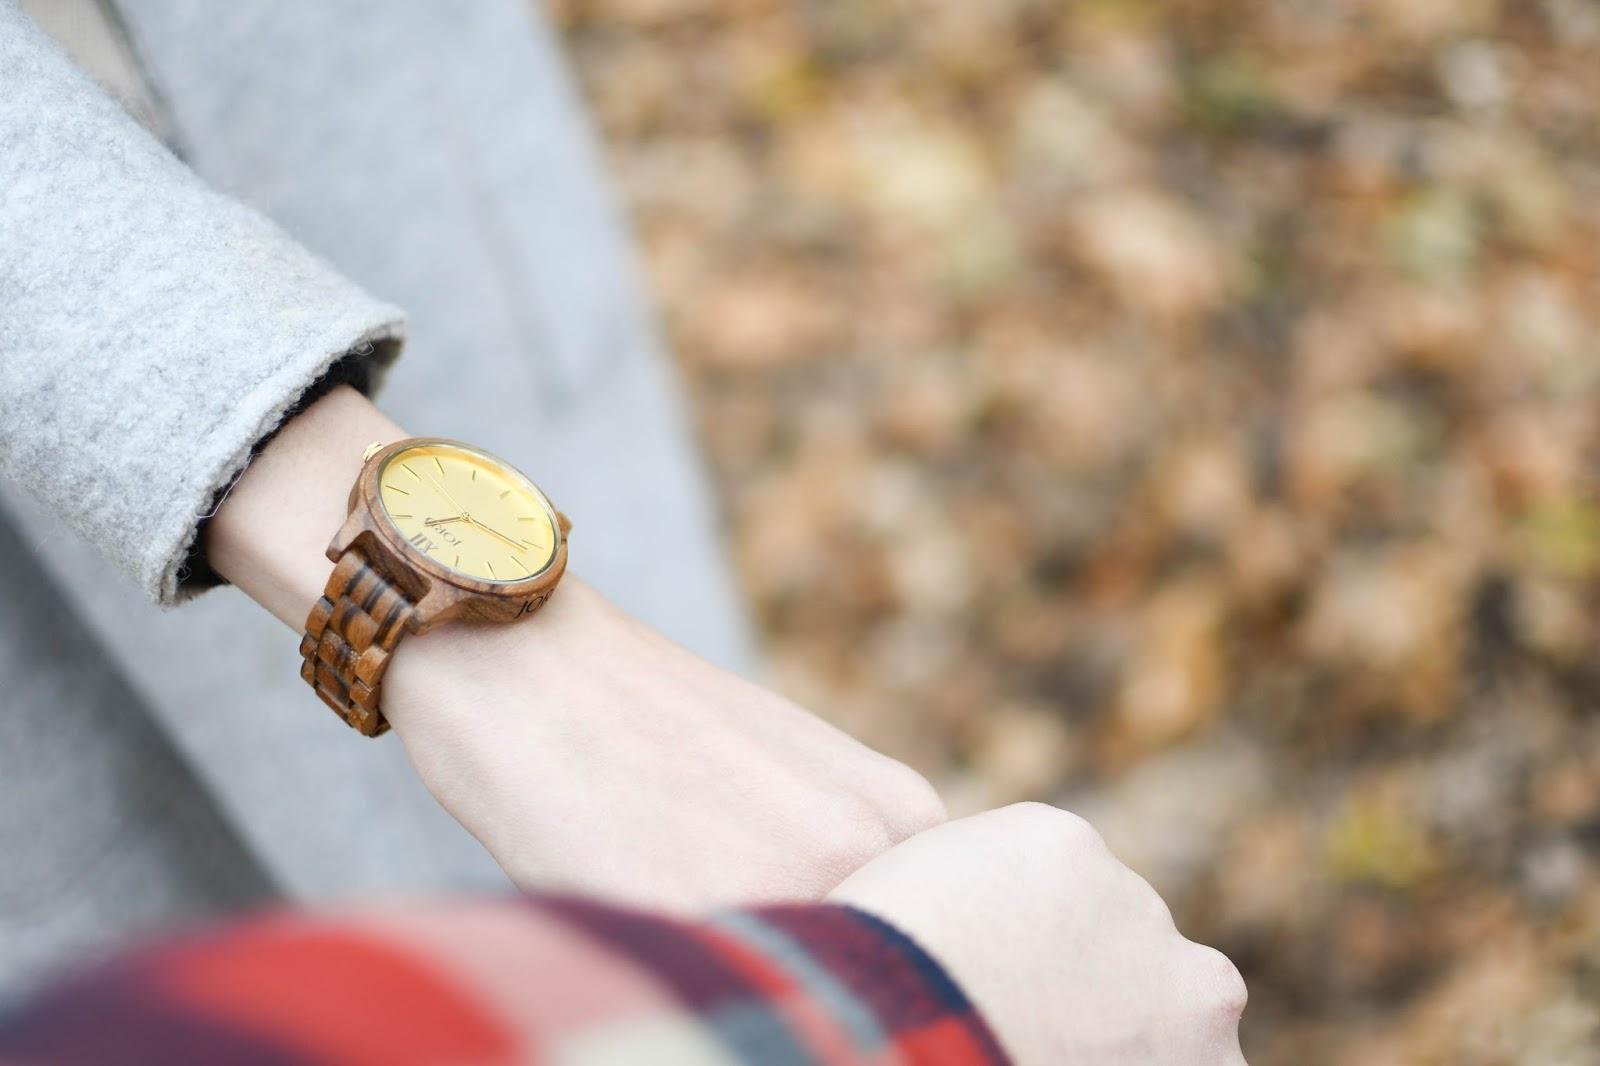 JORD Frankie wooden watch